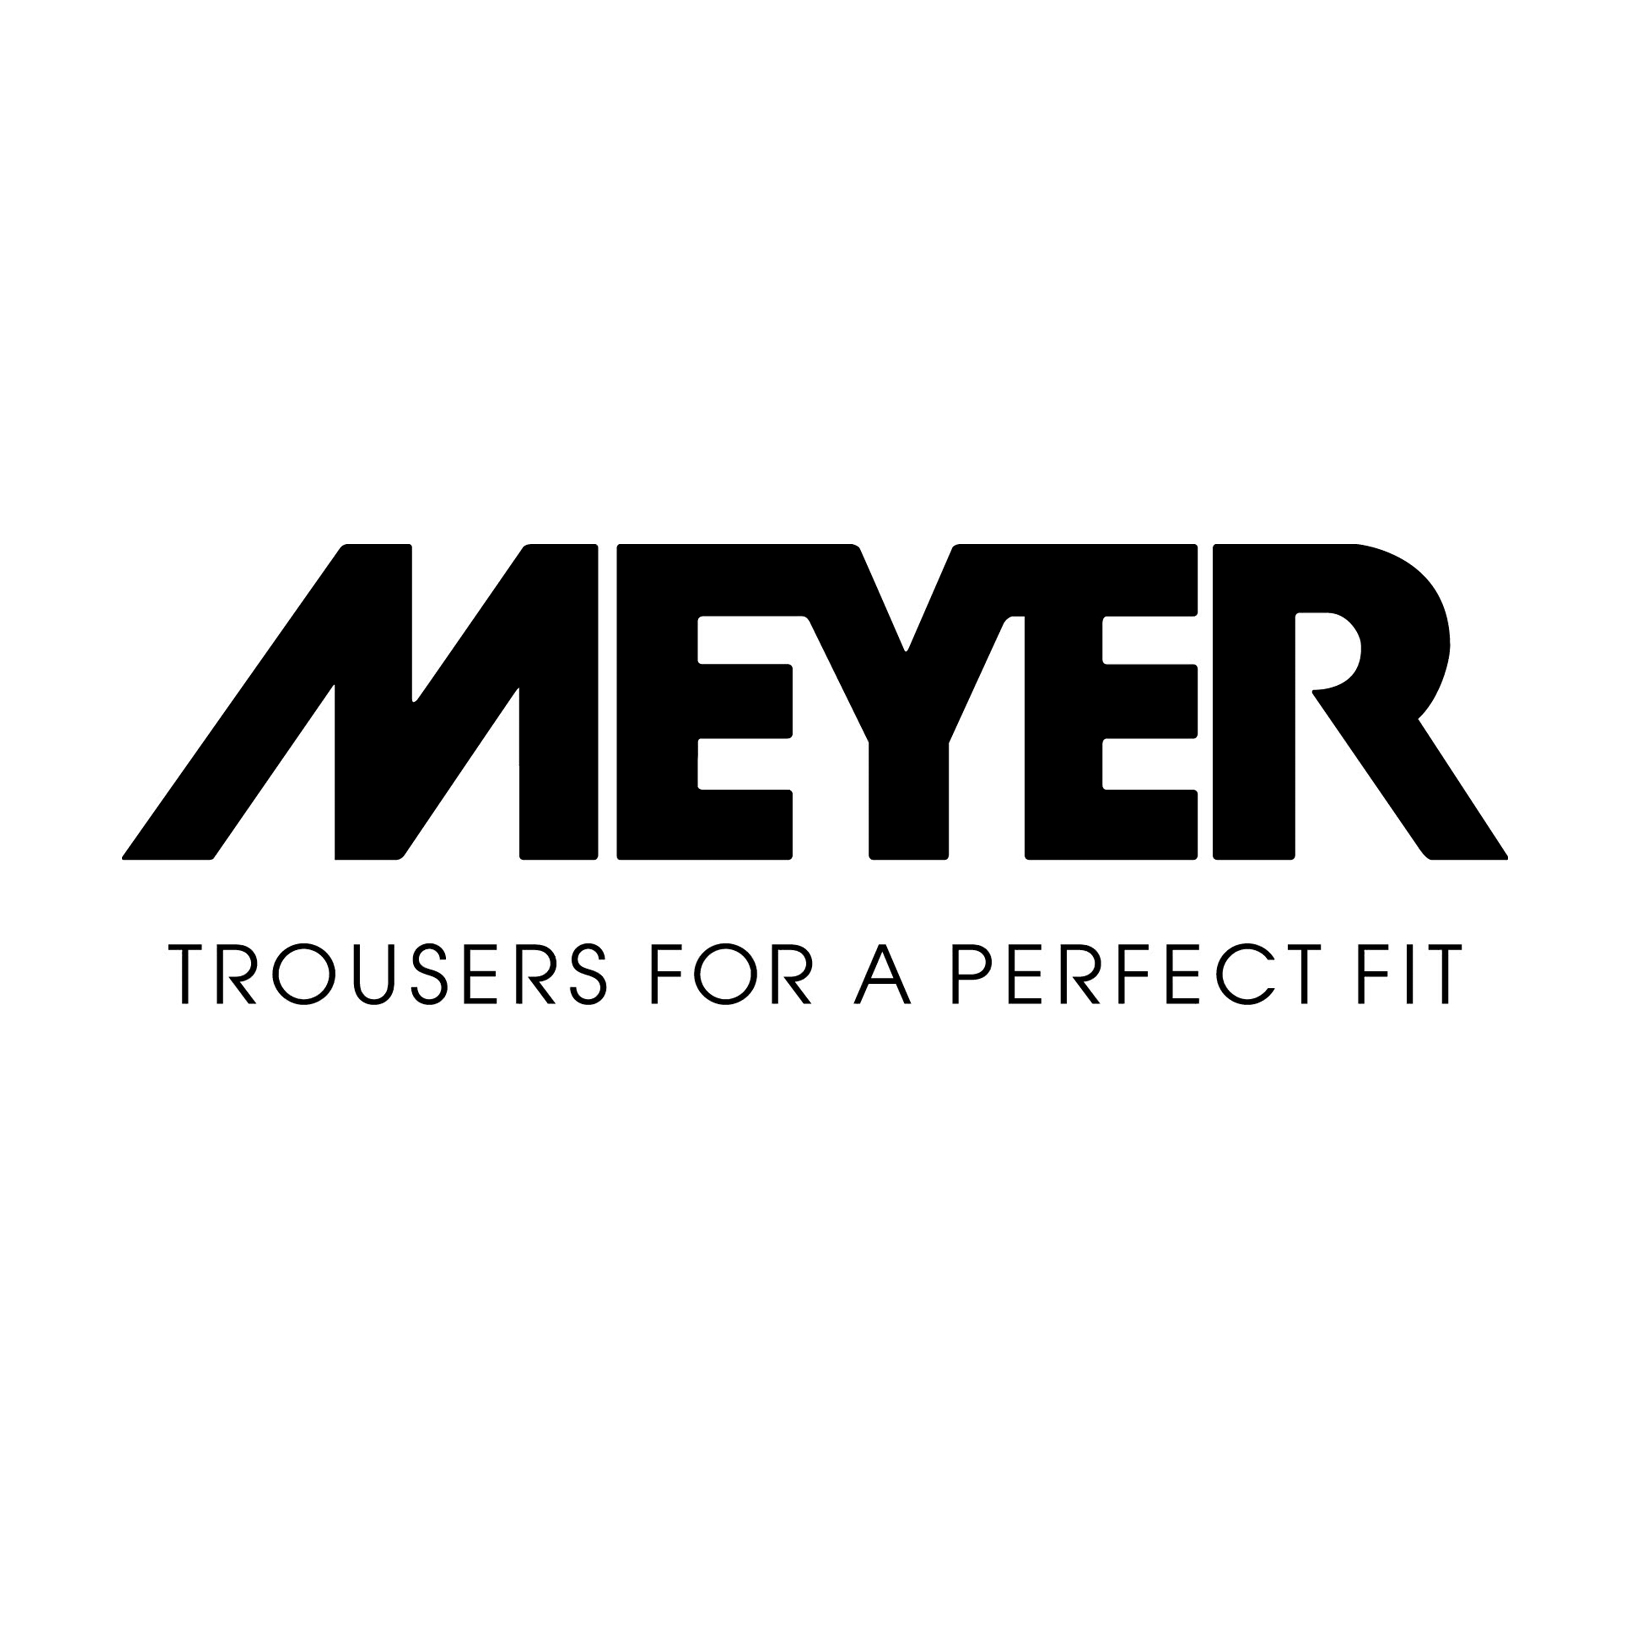 Meyer image 1